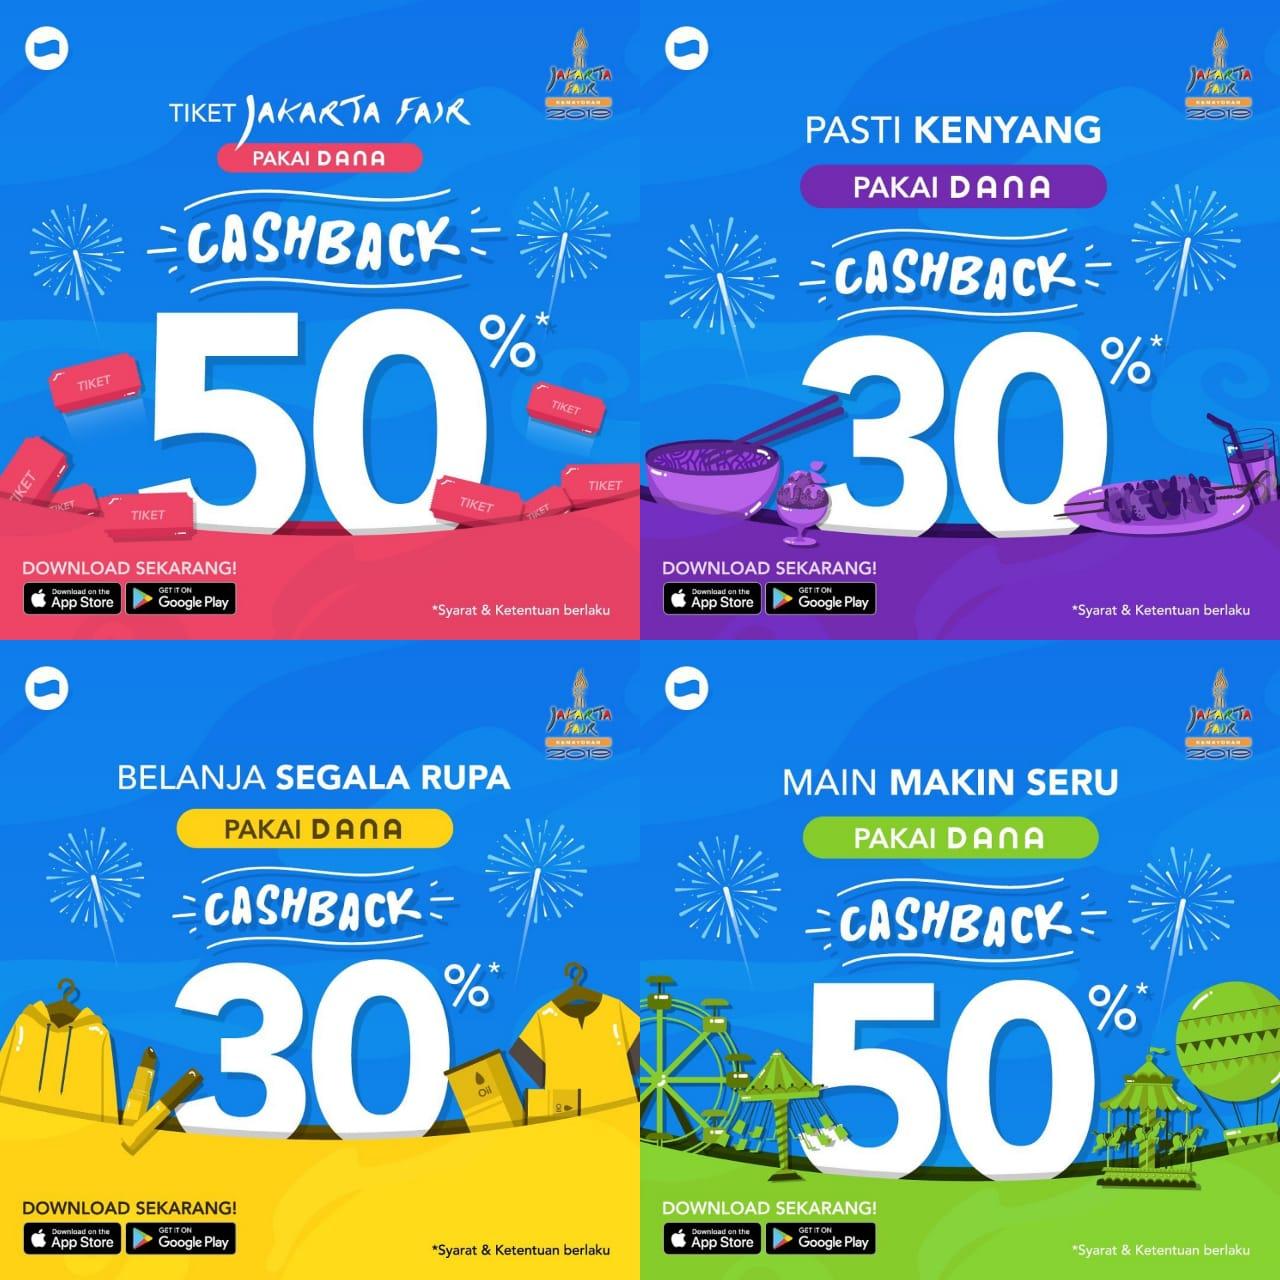 Jakarta Fair Promo Spesial Dana, Cashback Hingga 50%